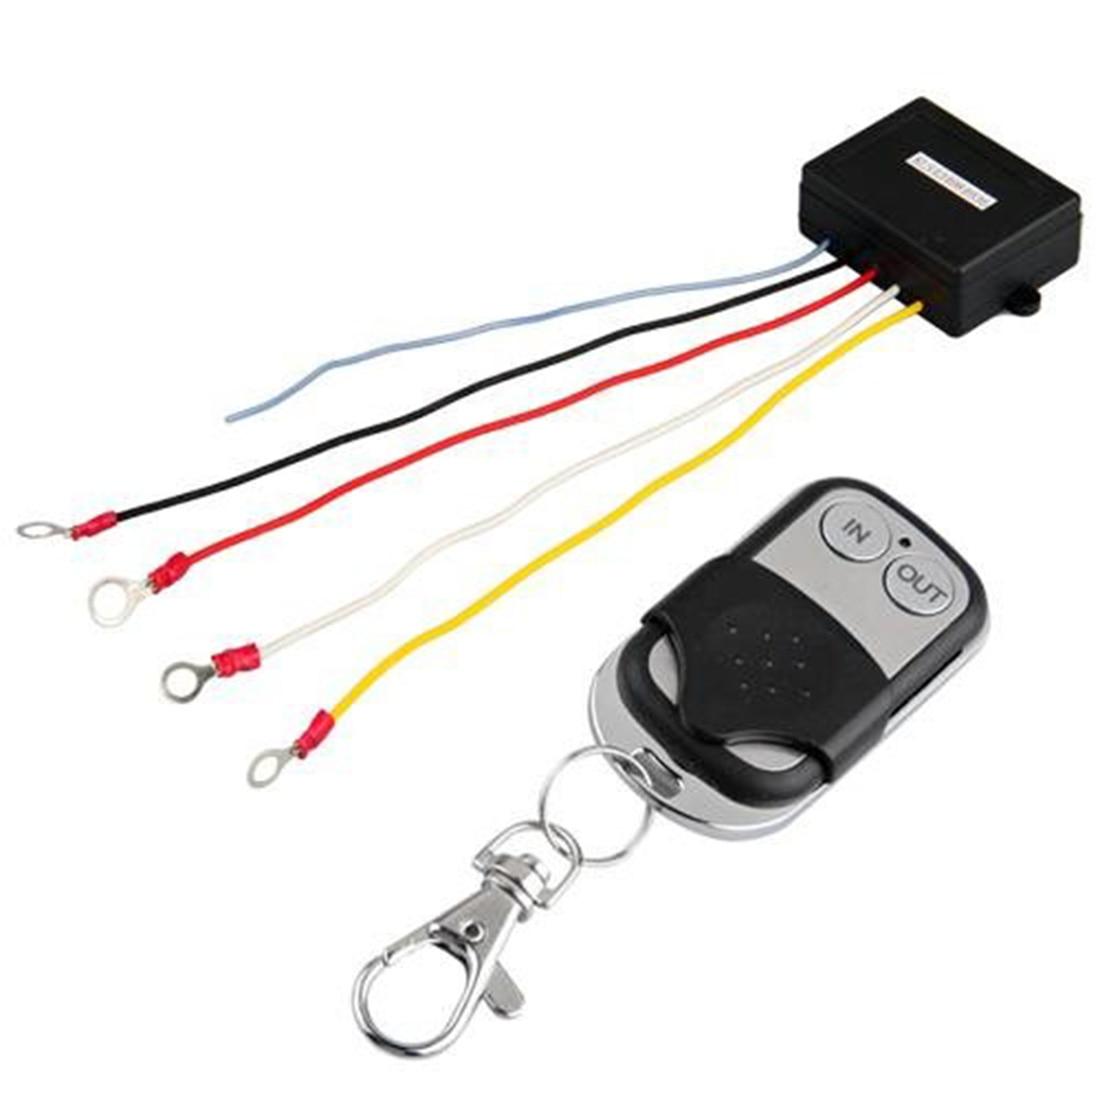 medium resolution of marsnaska wireless remote control kit for truck jeep atv winch wireless remote control 15m 12 volt